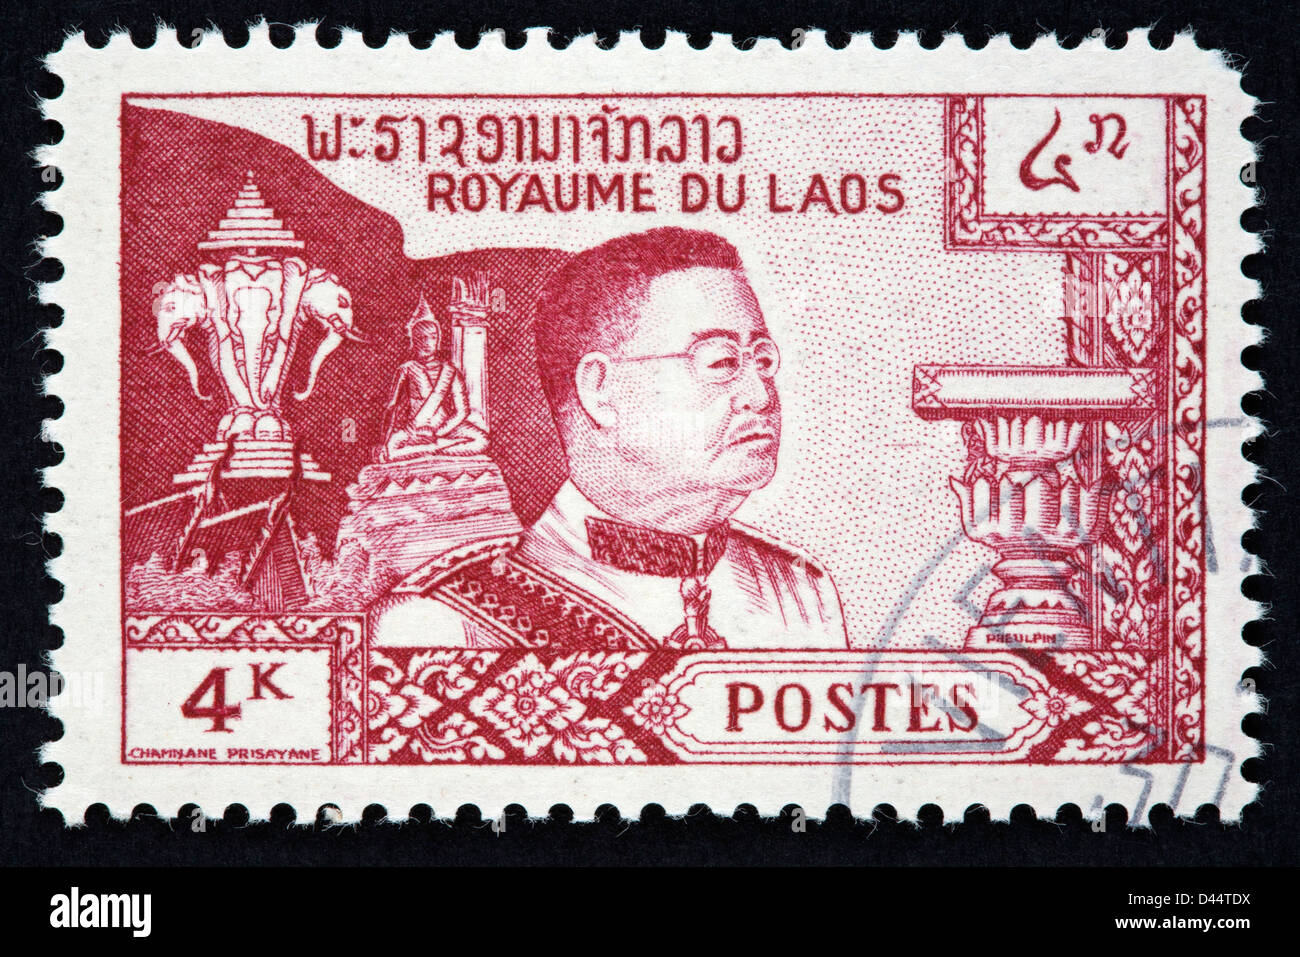 Laotian postage stamp - Stock Image